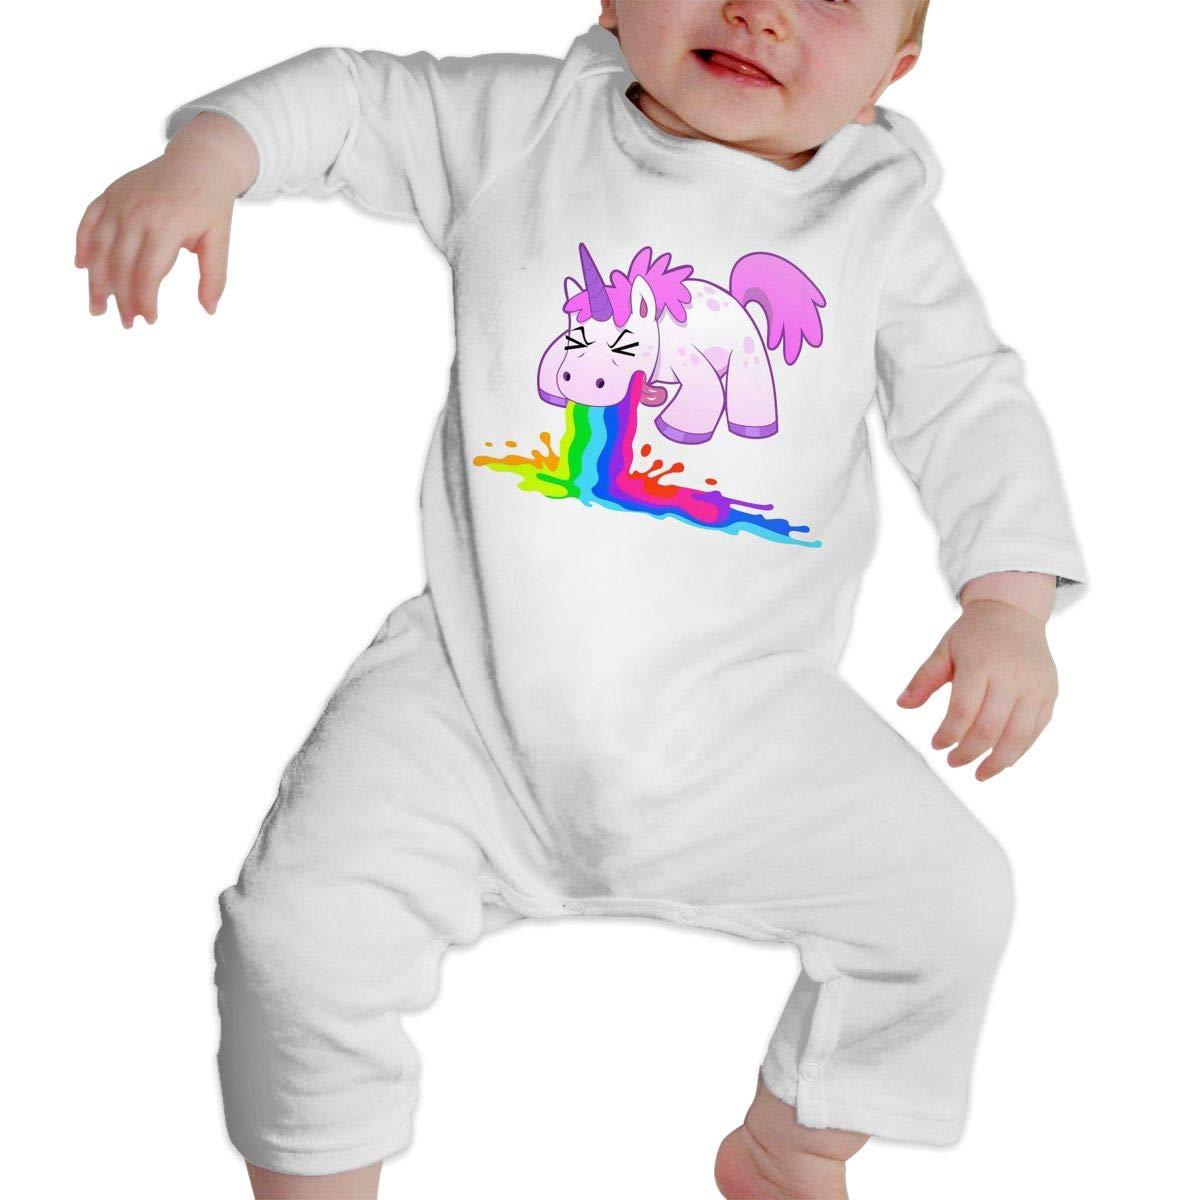 CharmKAT Unisex Baby Crew Neck Long-Sleeve Solid Color Romper Jumpsuit